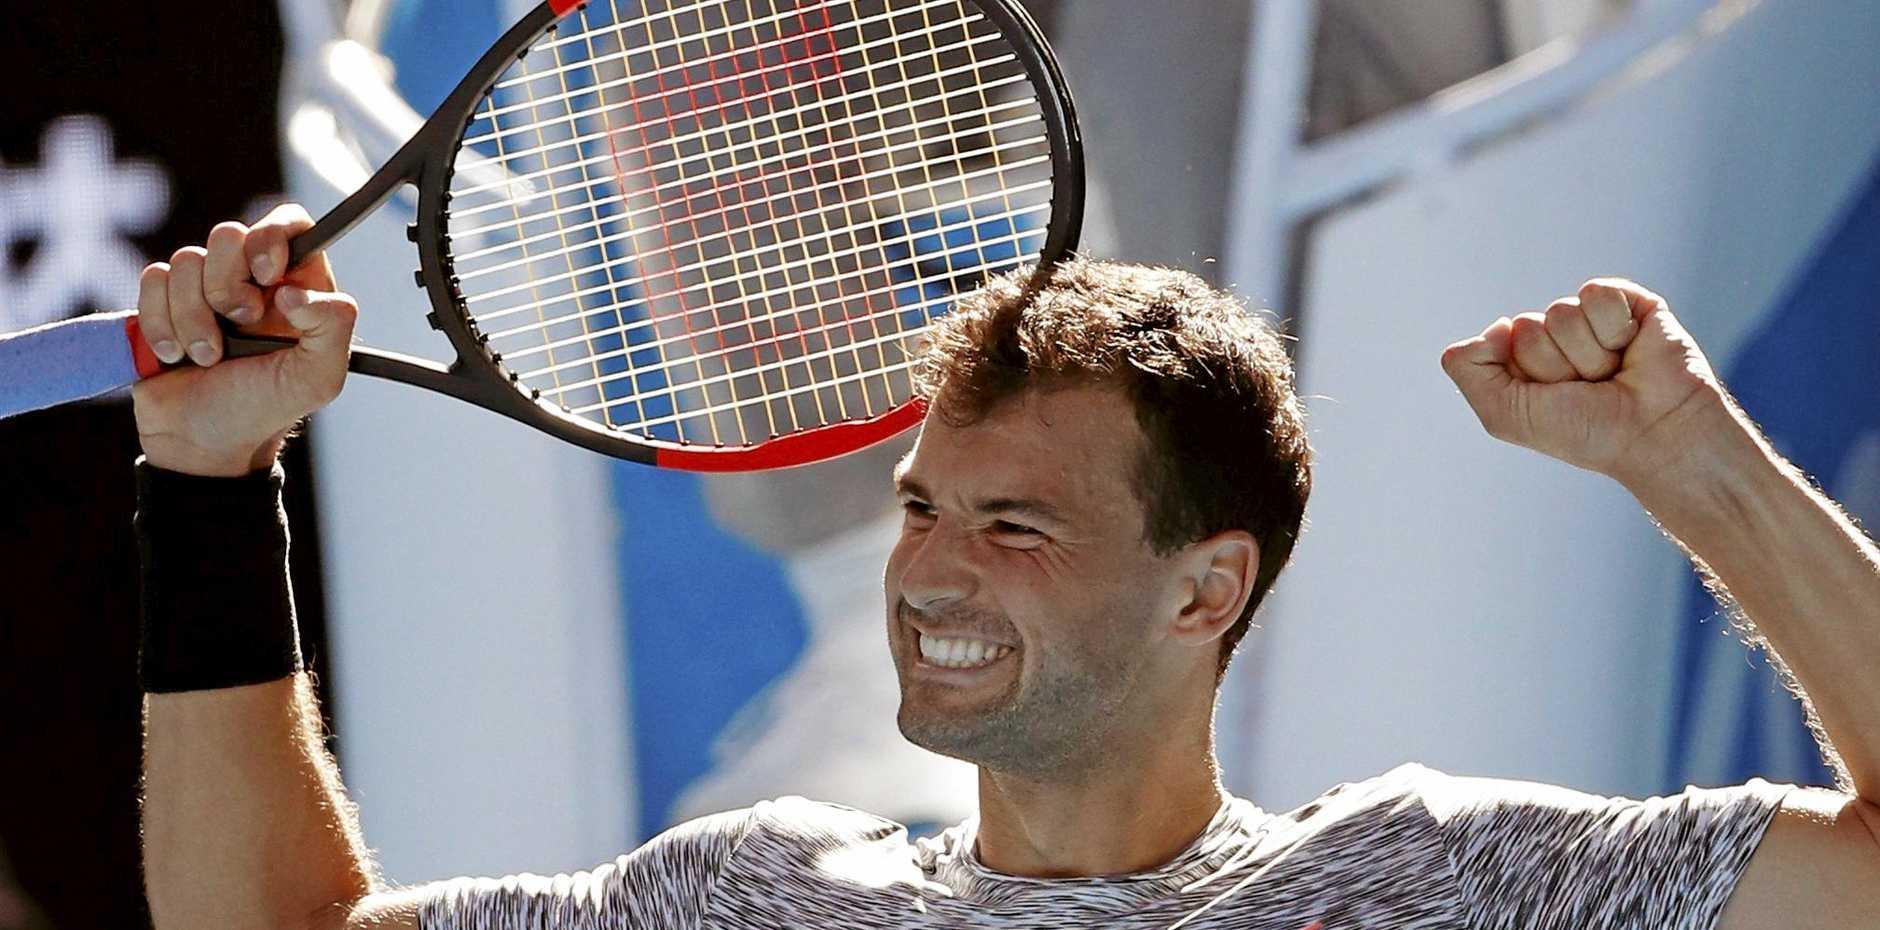 Bulgaria's Grigor Dimitrov celebrates defeating Belgium's David Goffin in the Australian Open quarter-finals.